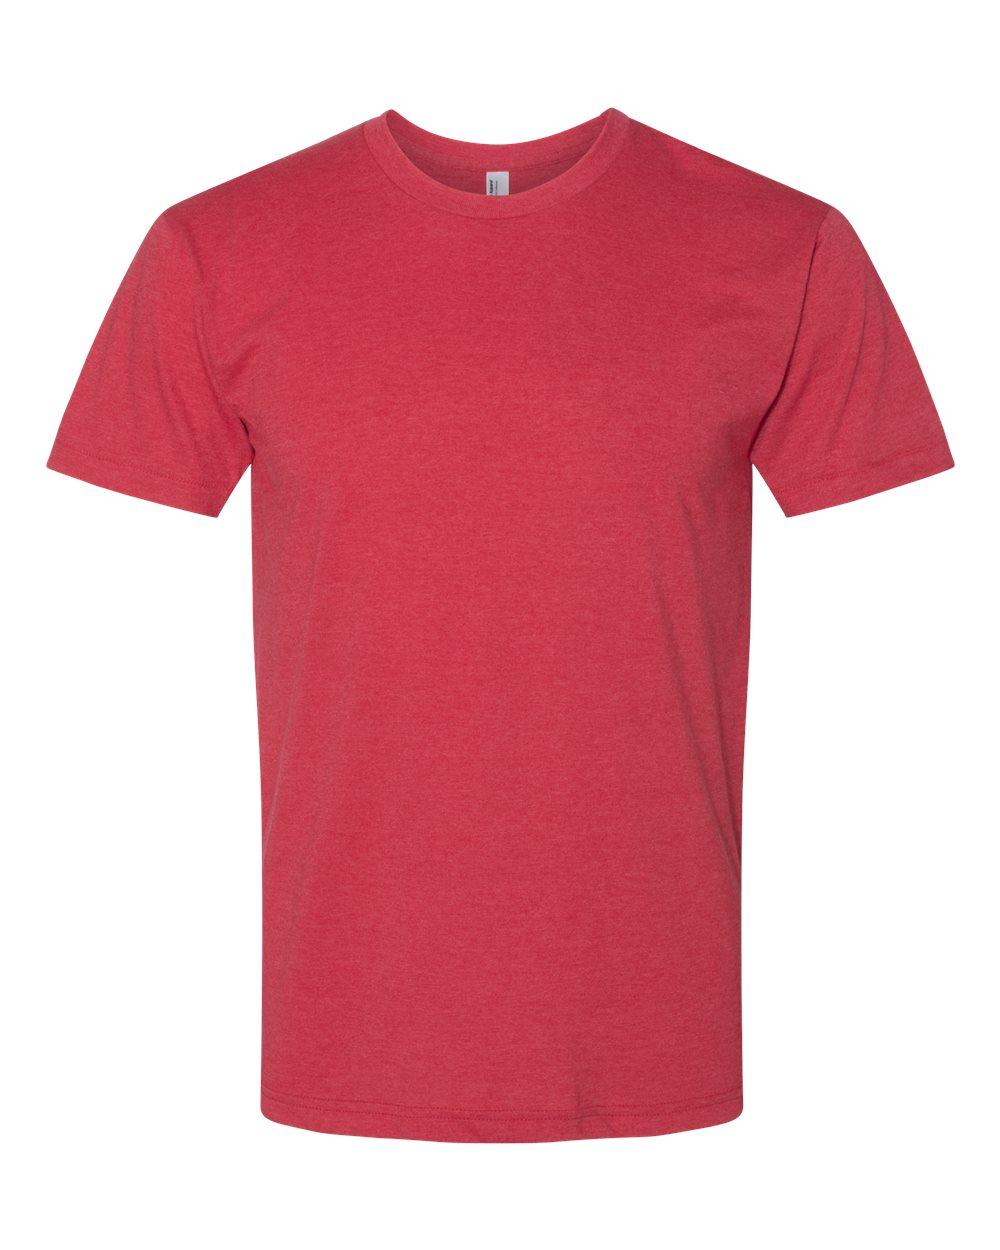 American-Apparel-Mens-Slim-Fit-50-50-Cotton-T-Shirt-Tee-BB401W-up-to-2XL thumbnail 36